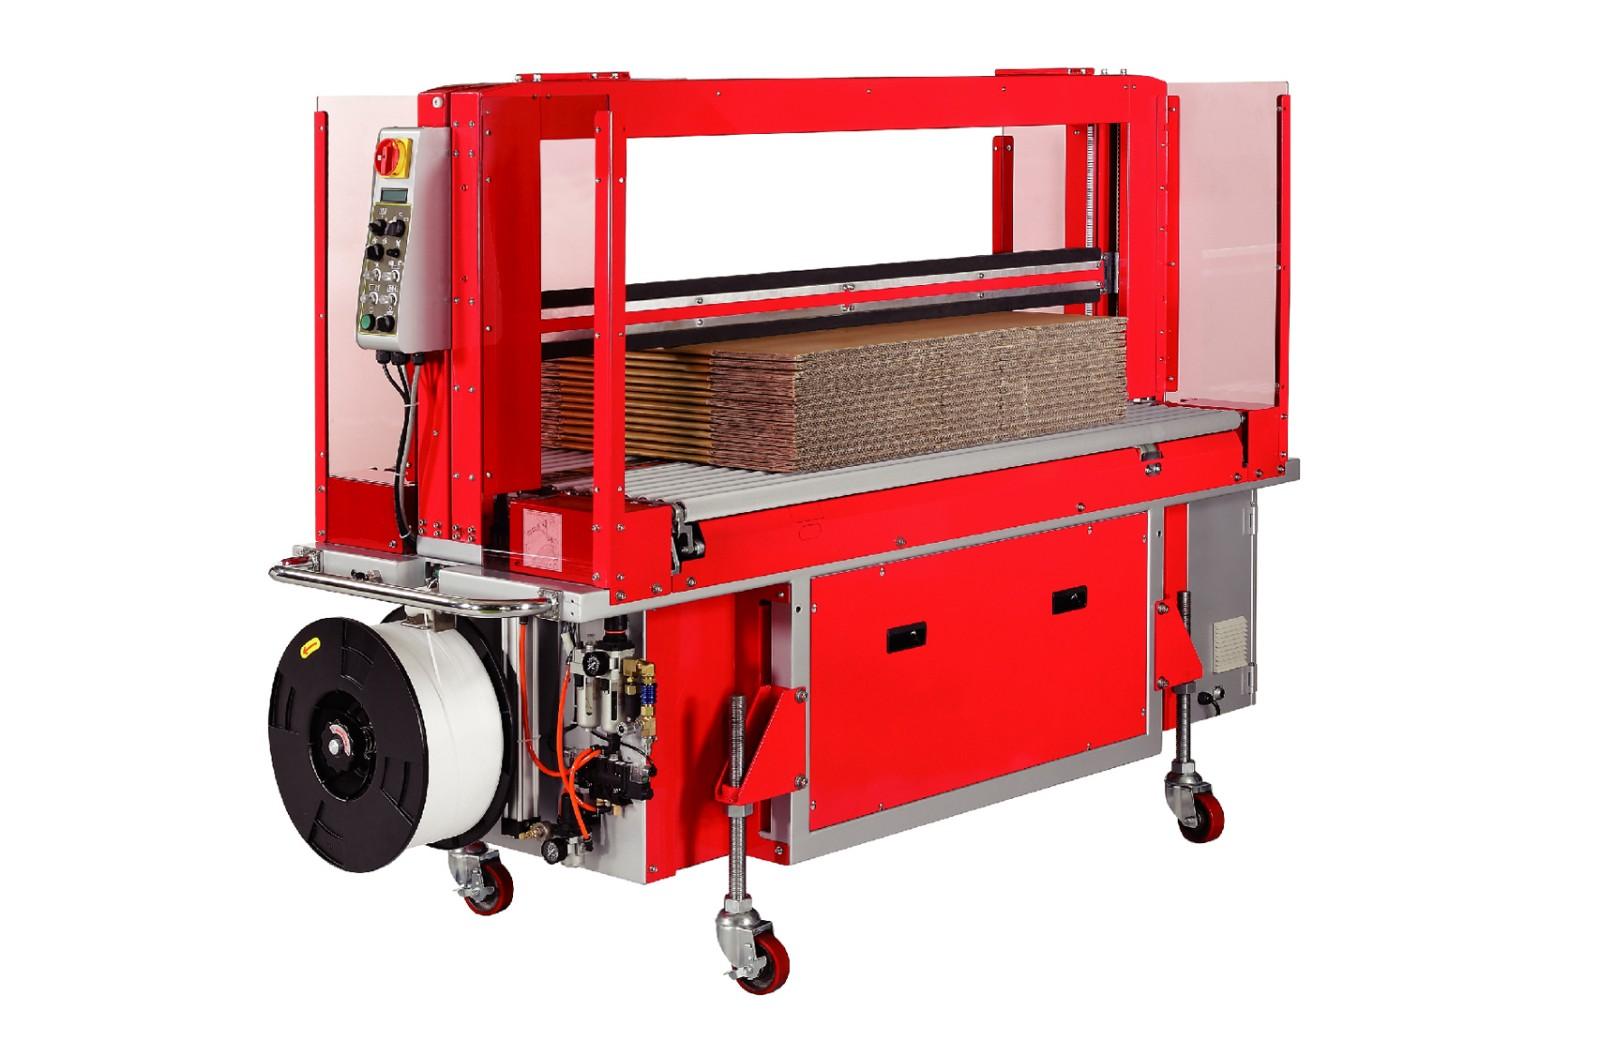 ----------TP-702C 系列---------- 高速瓦楞纸箱捆包机